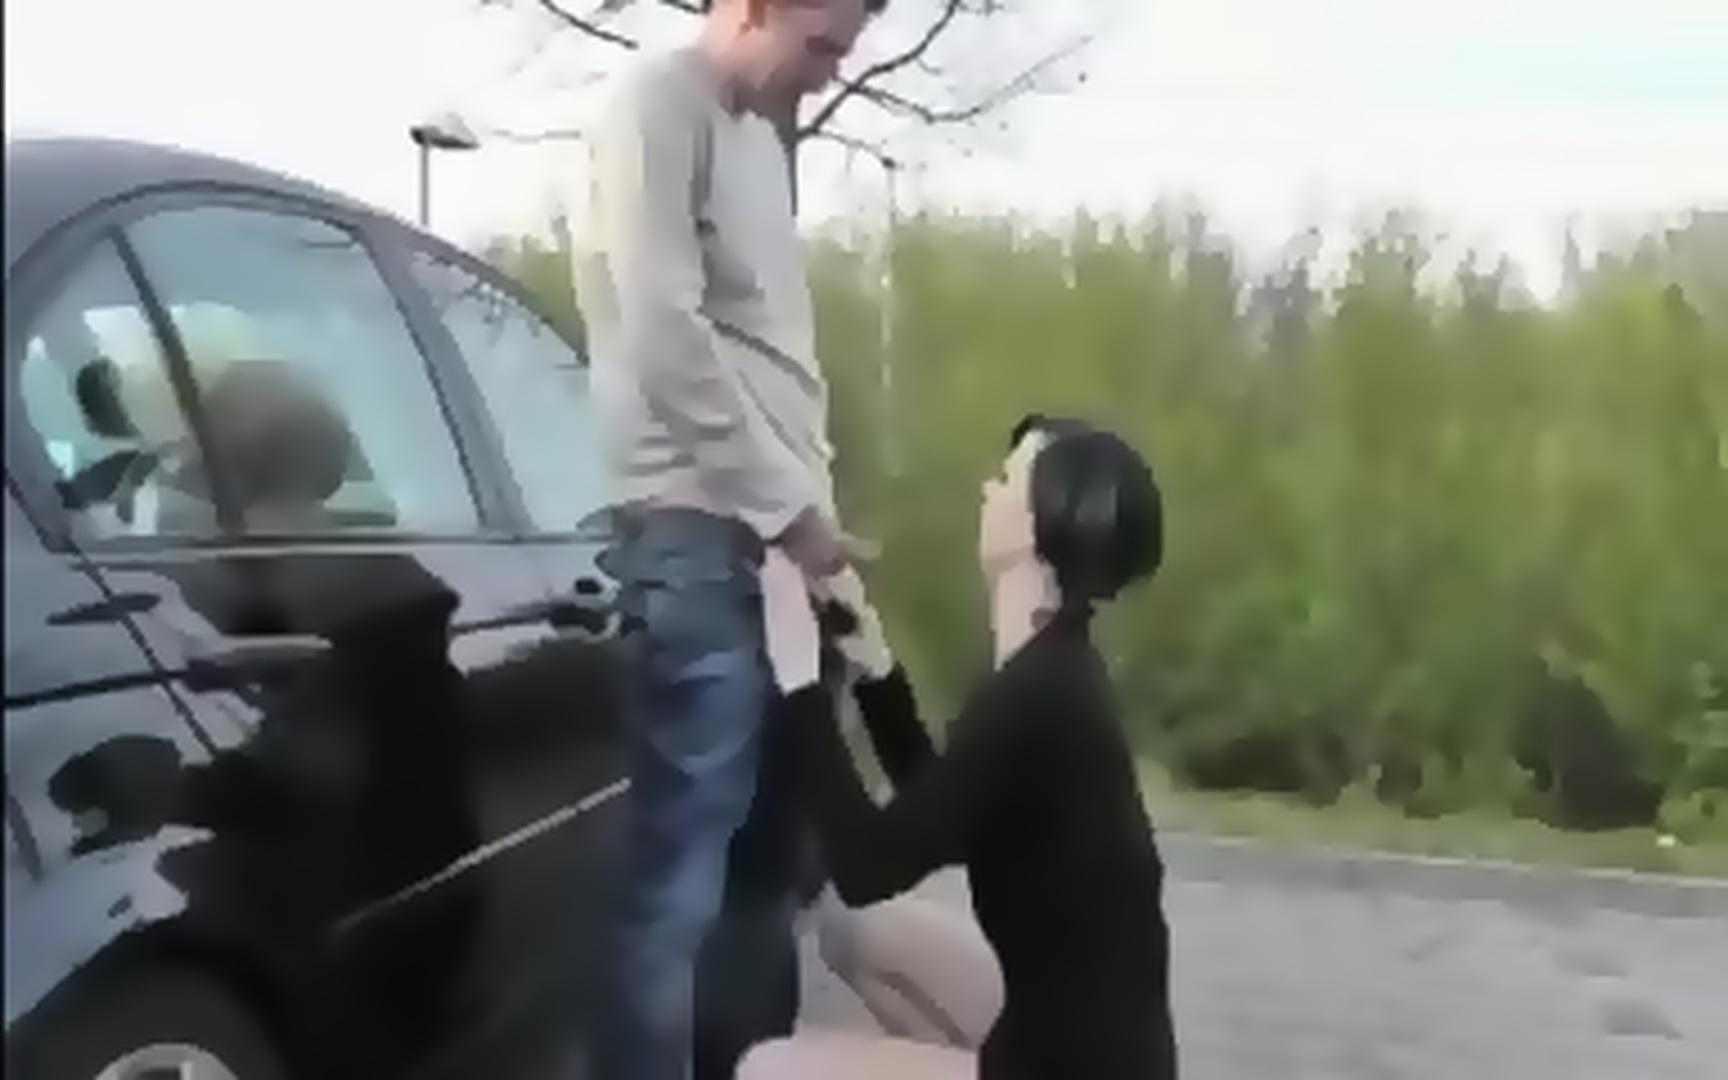 Free teasing cock video